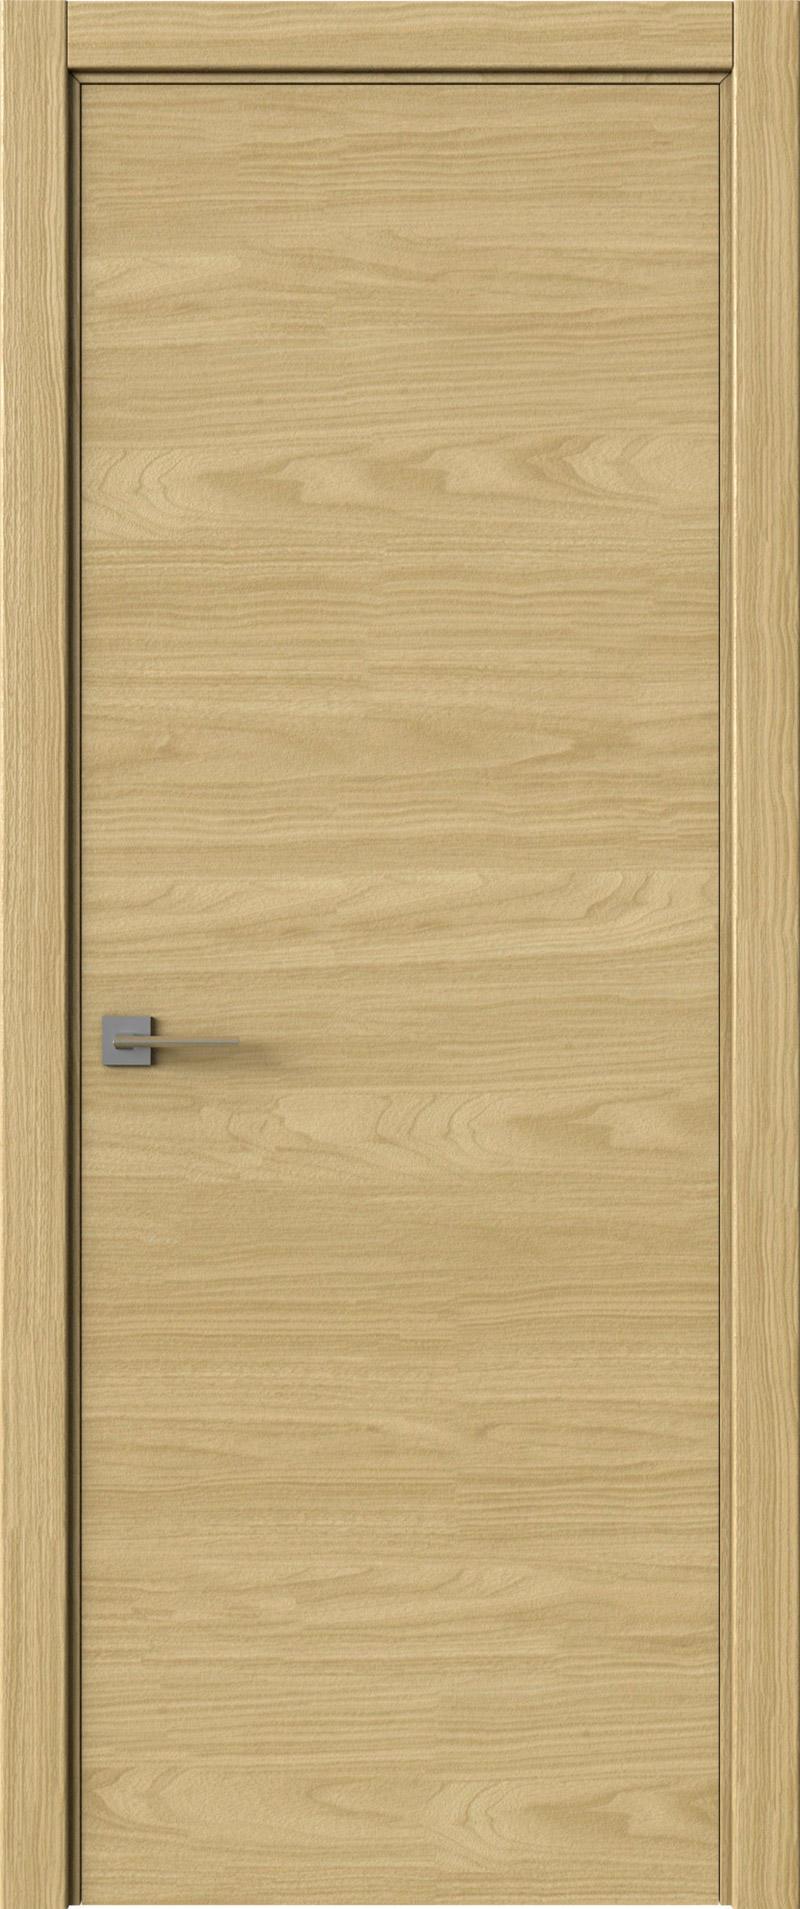 Tivoli А-2 цвет - Дуб нордик Без стекла (ДГ)